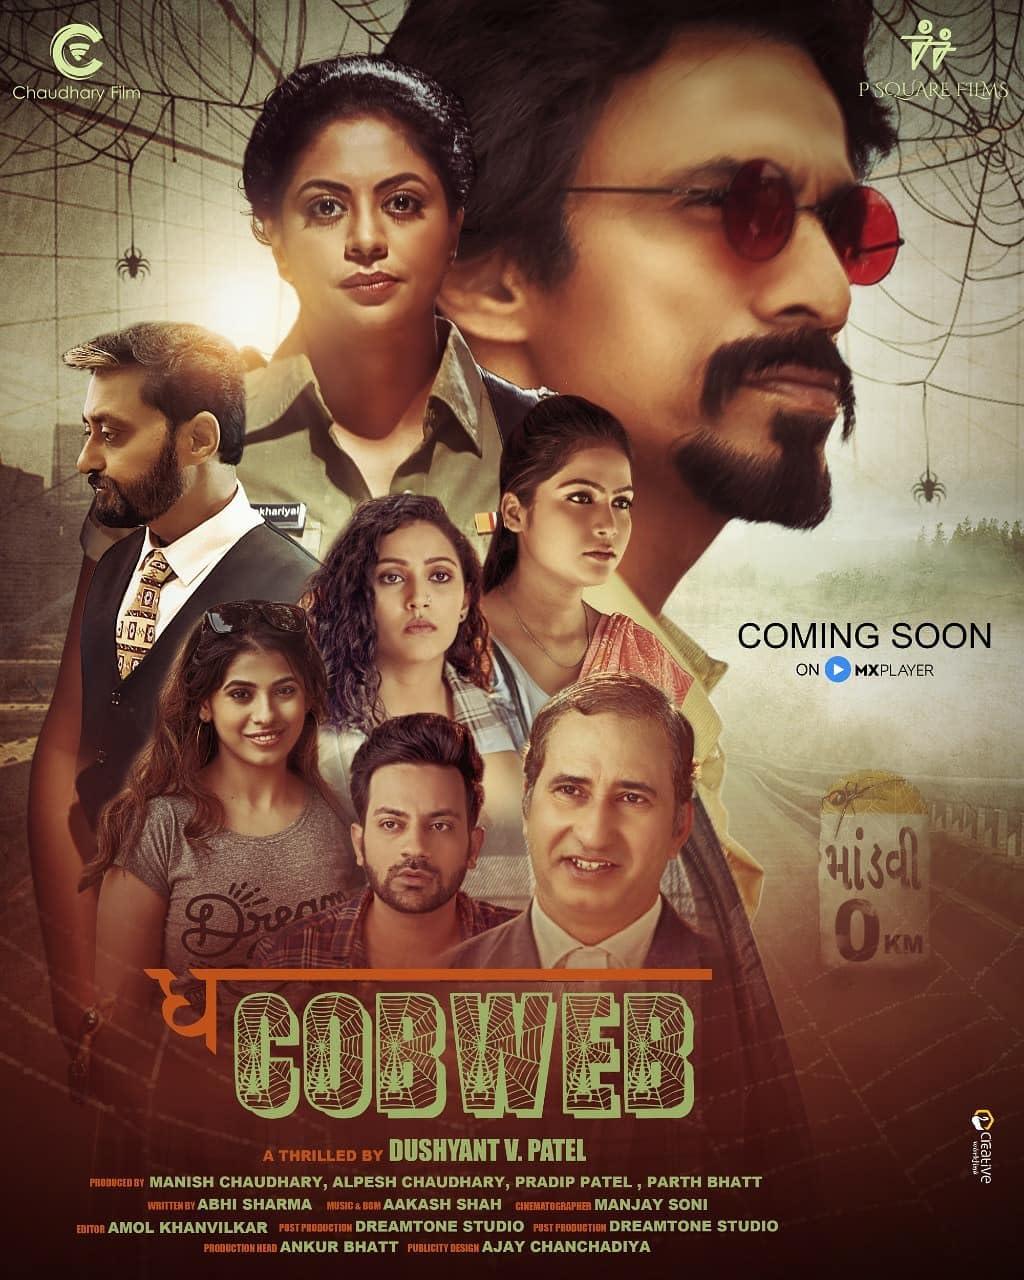 The Cobweb 2021 S01 Hindi MX Original Complete Web Series 720p HDRip 1.3GB | 604MB Download